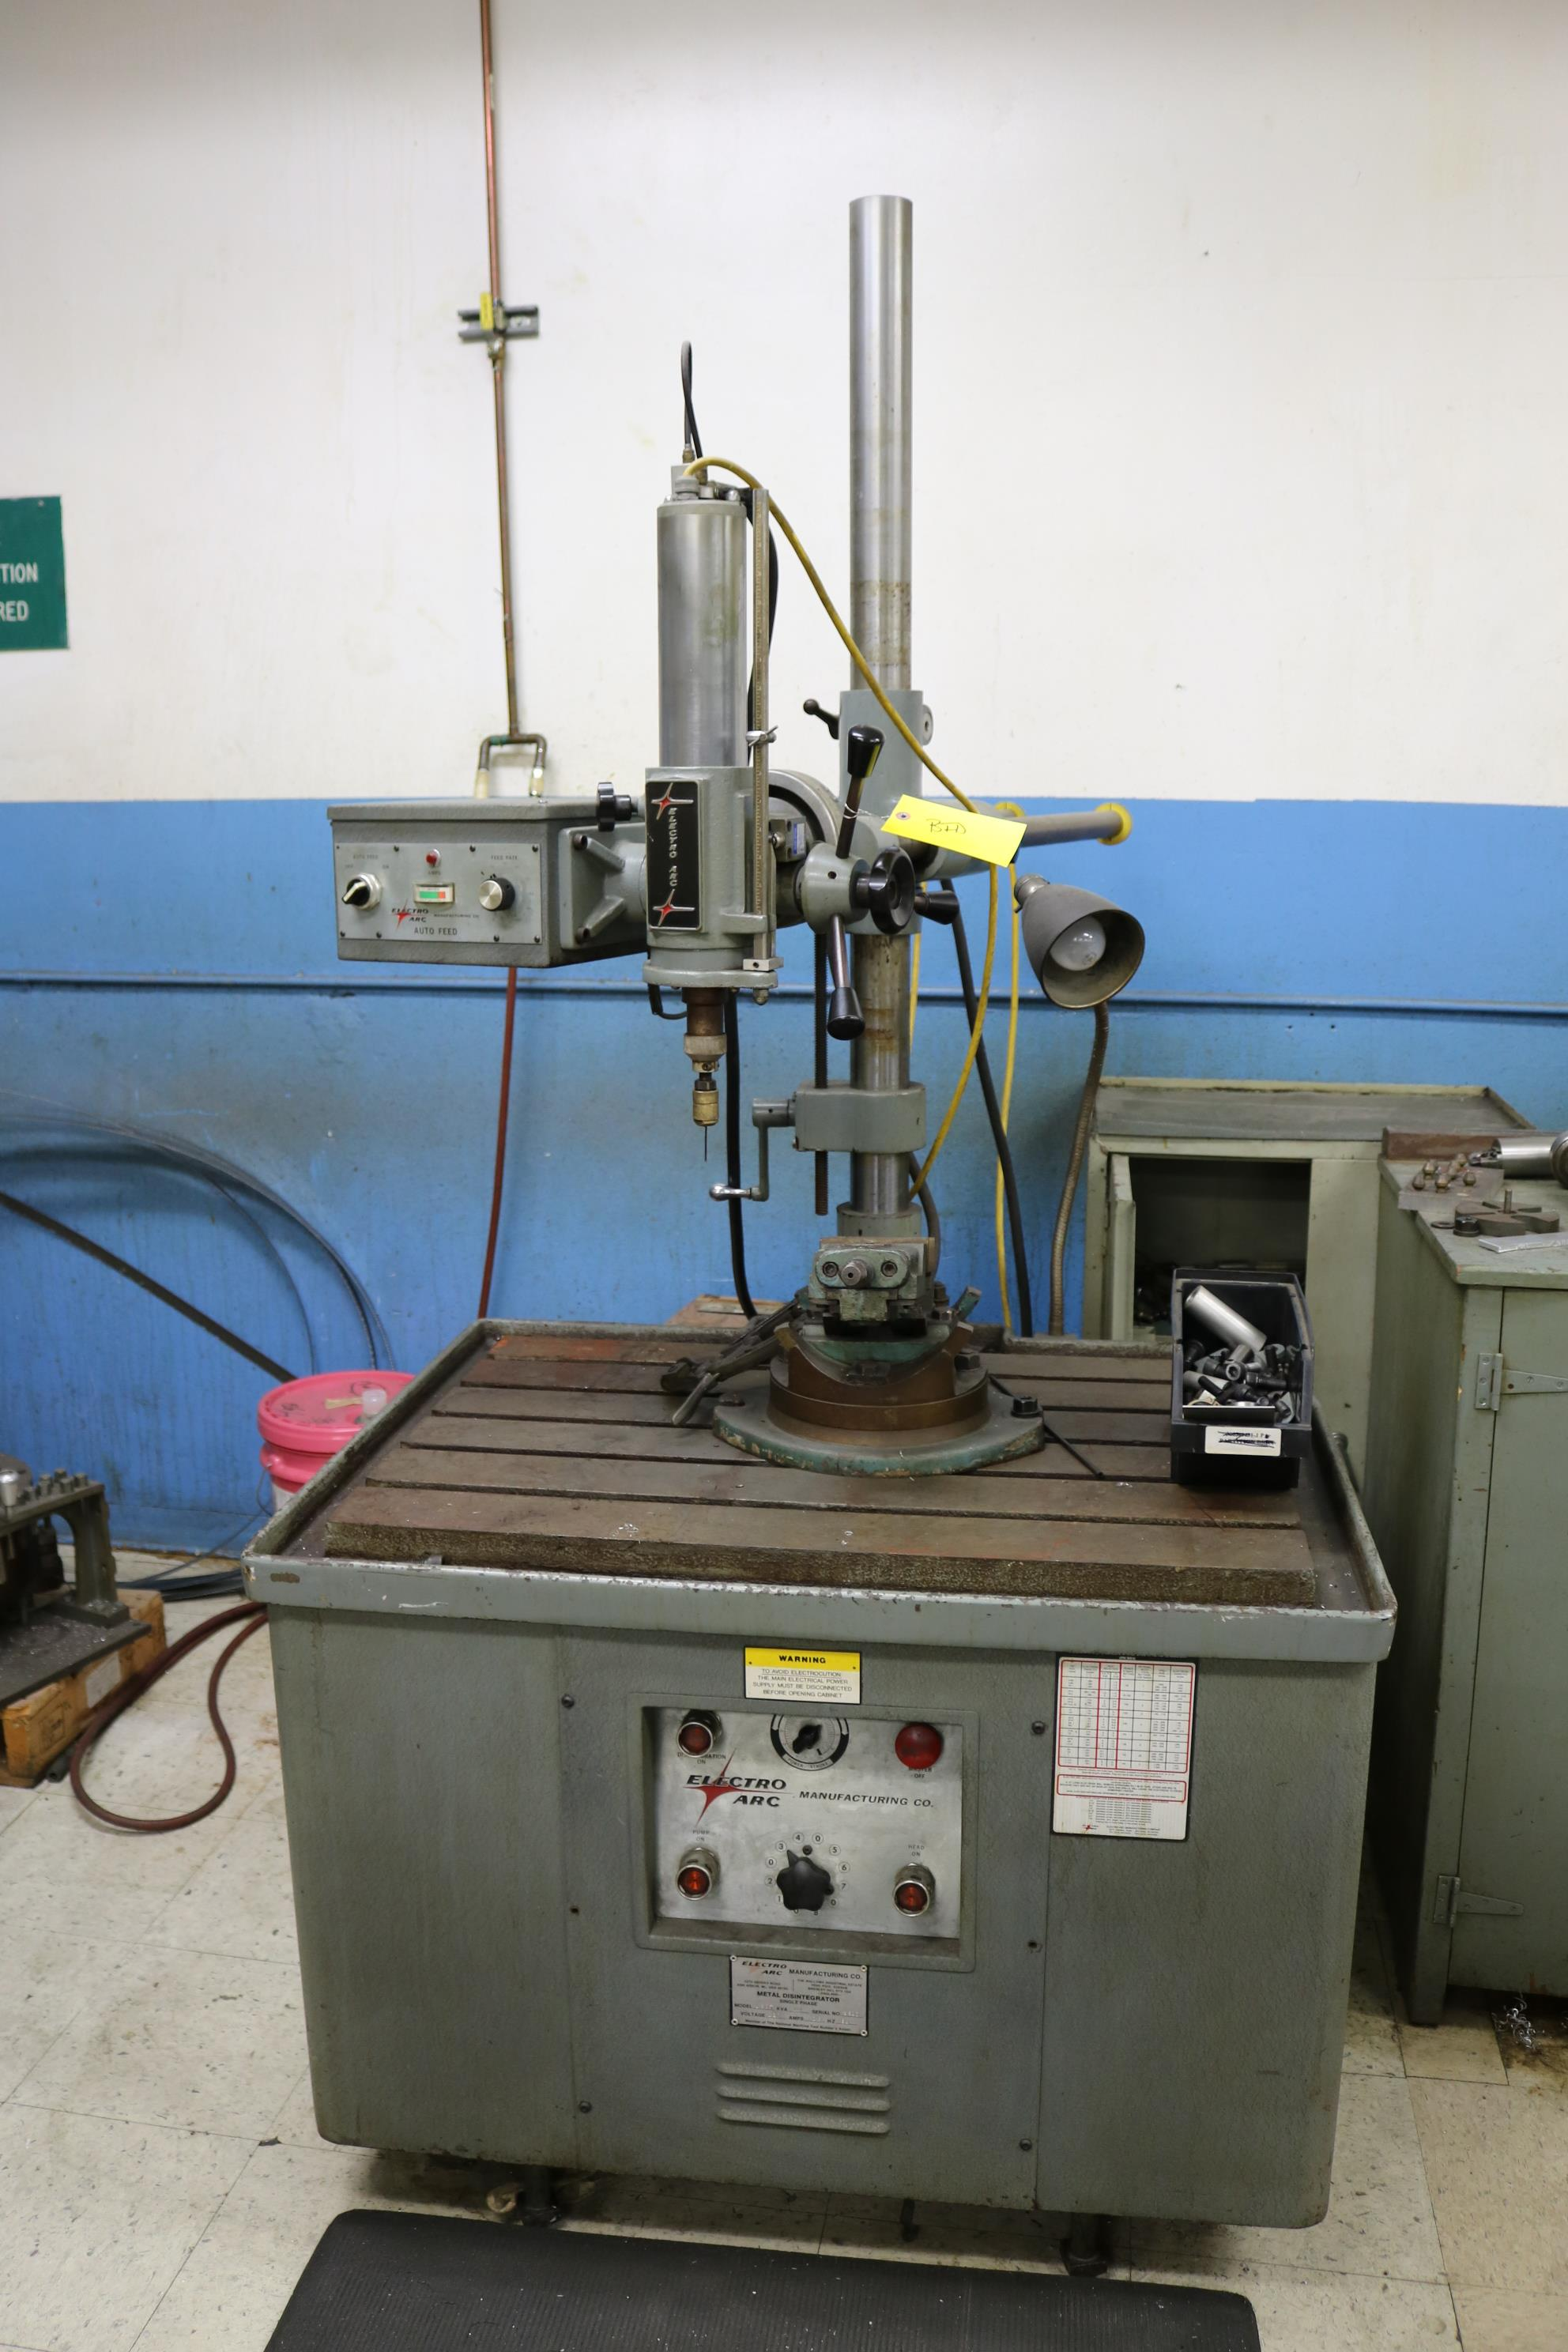 Lot 20 - ELECTRO ARC TAP METAL DISINTEGRATOR, MODEL 1SQT, 10 KVA, S/N 8800